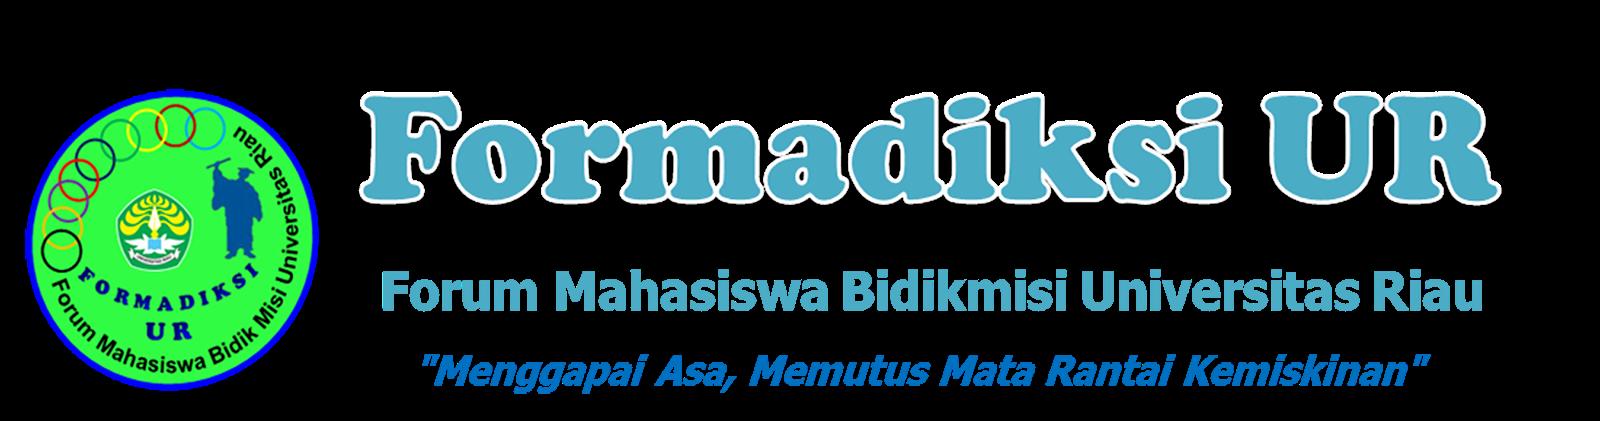 Formadiksi UR | Forum Mahasiswa Bidik Misi Universitas Riau